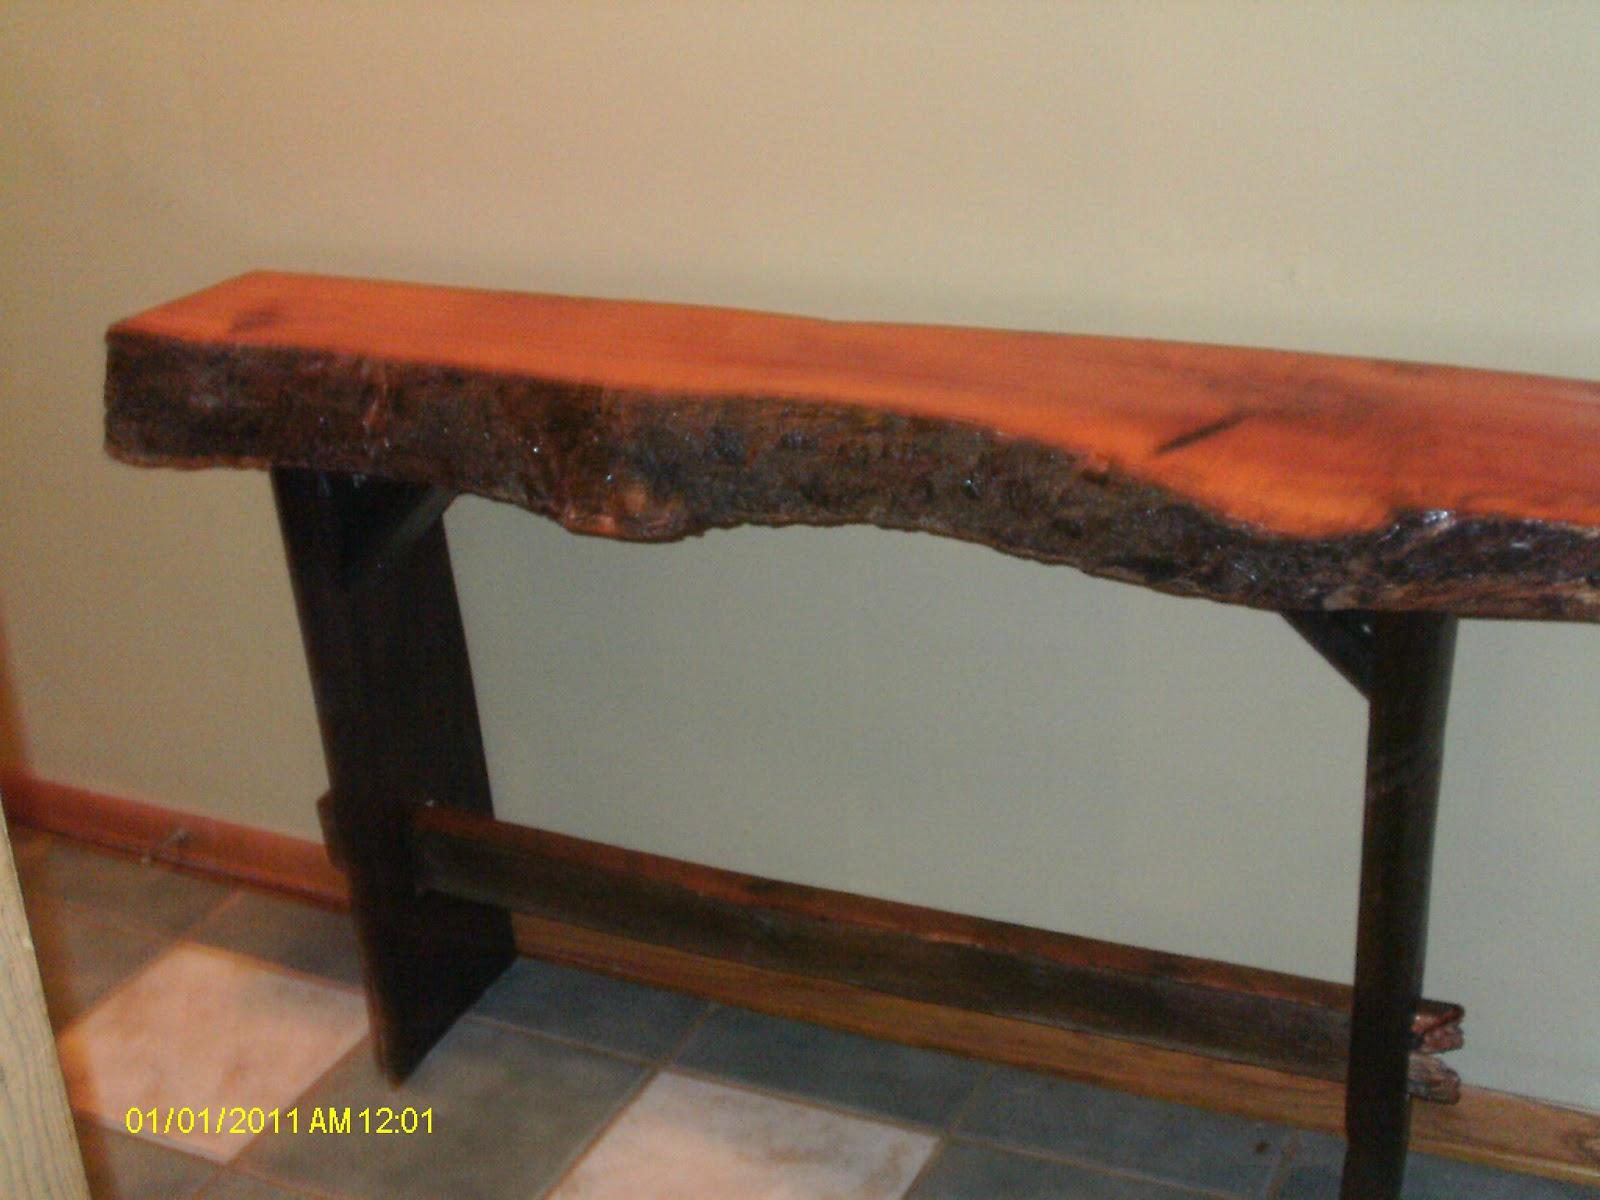 Handmade rustic log furniture 4 39 long x 32 tall x 10 for 10 deep sofa table